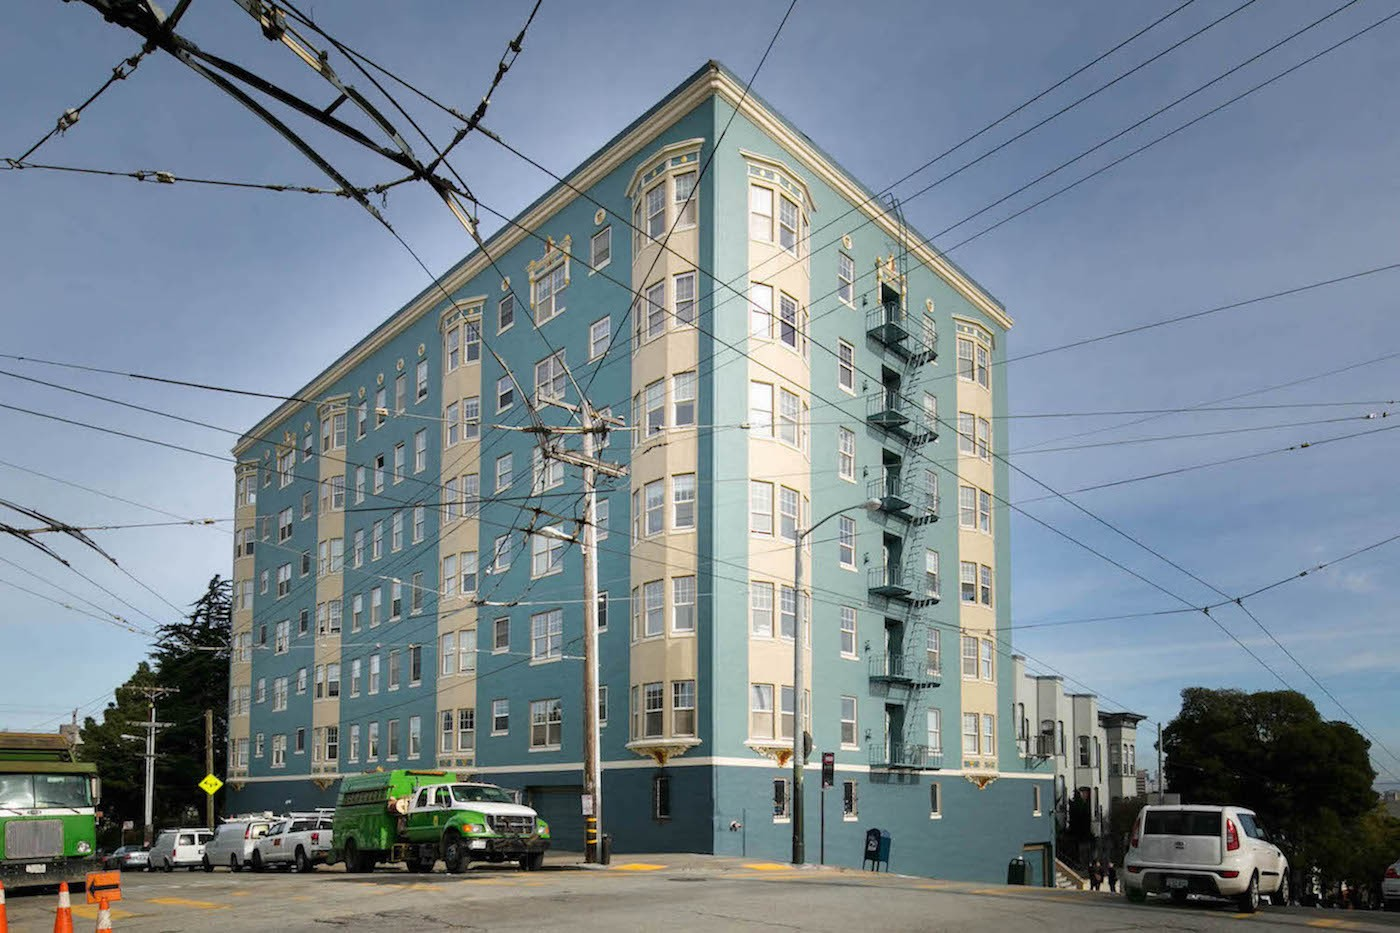 300 BUCHANAN Apartments